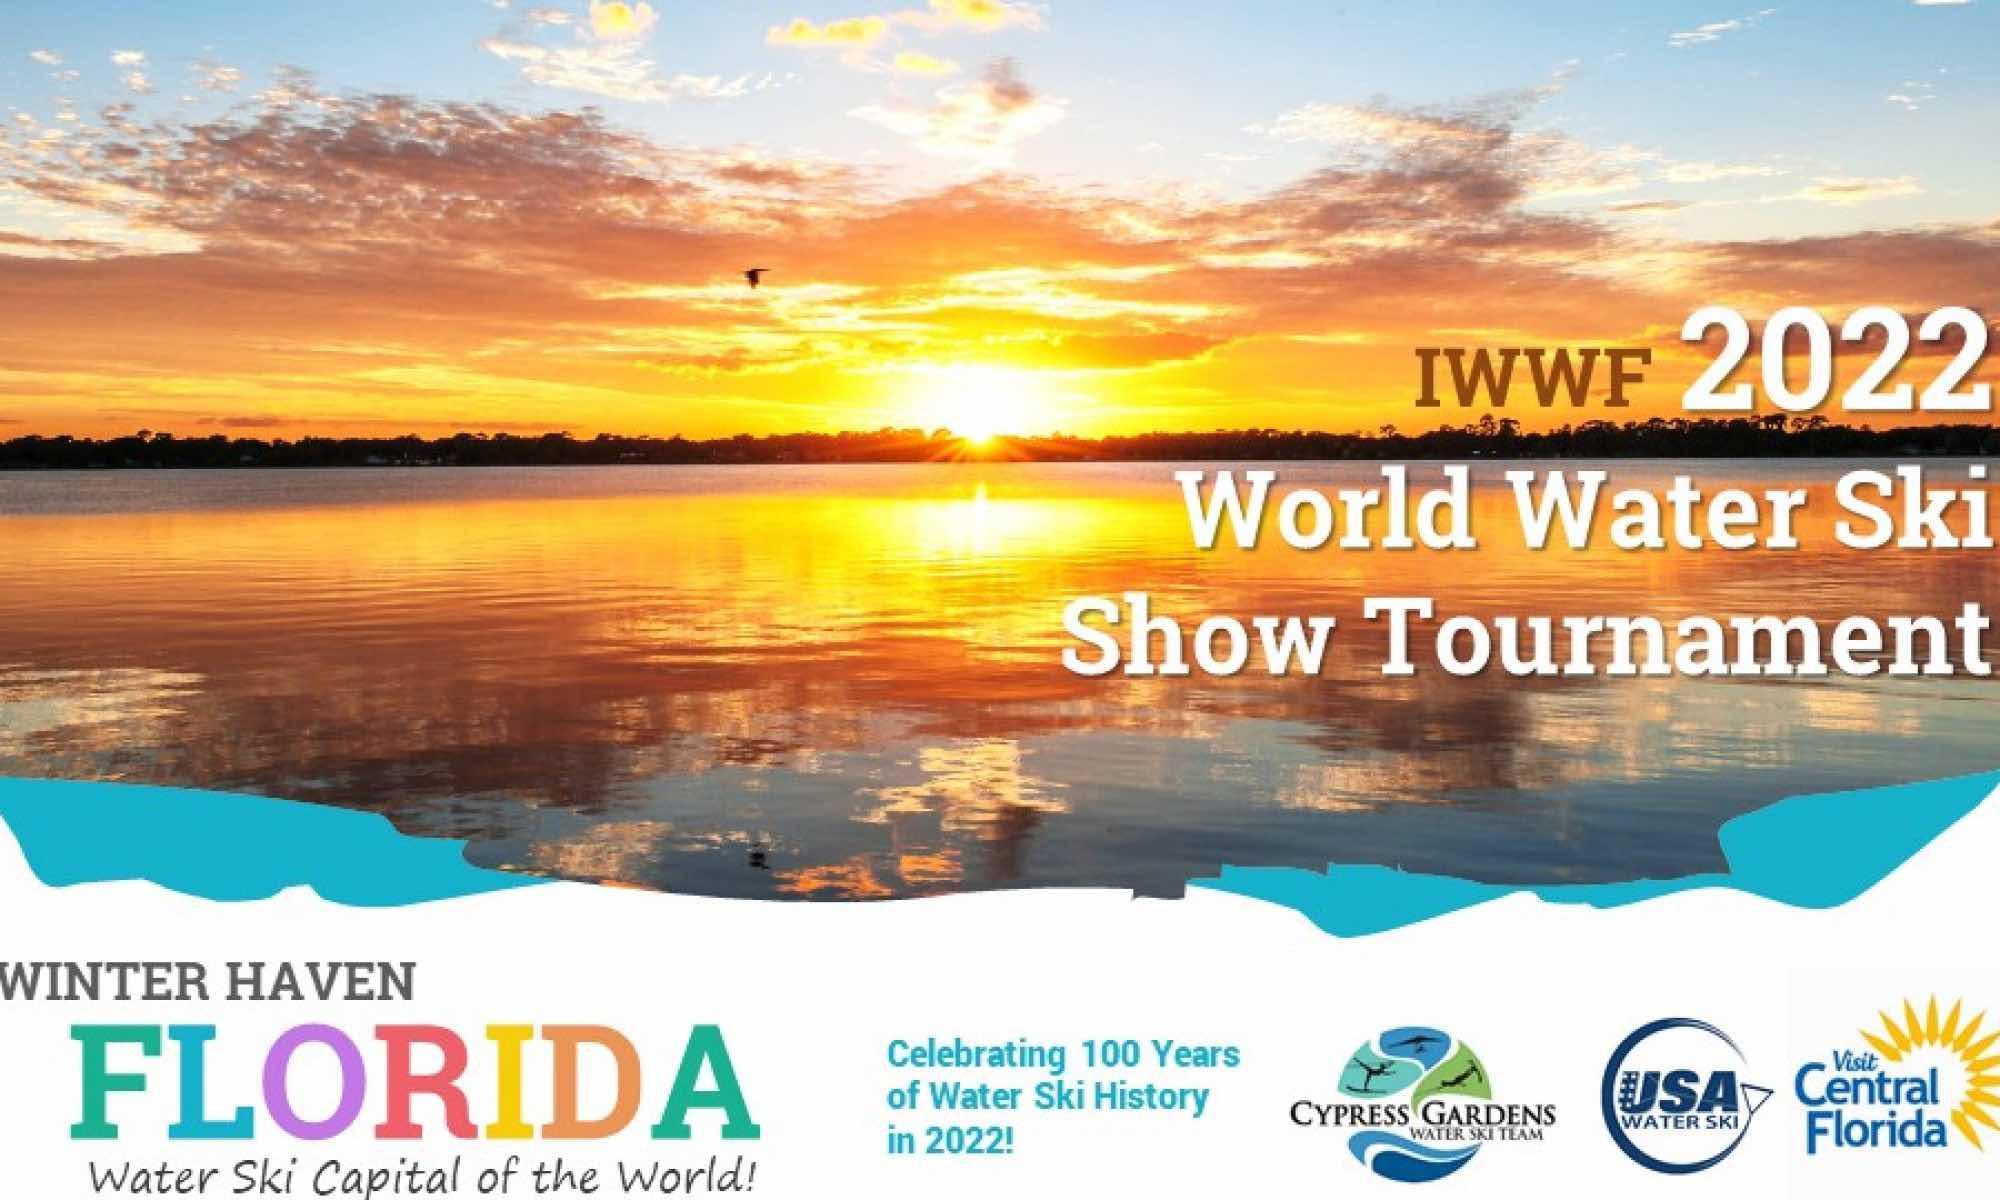 International World Water Ski Show Tournament 2022